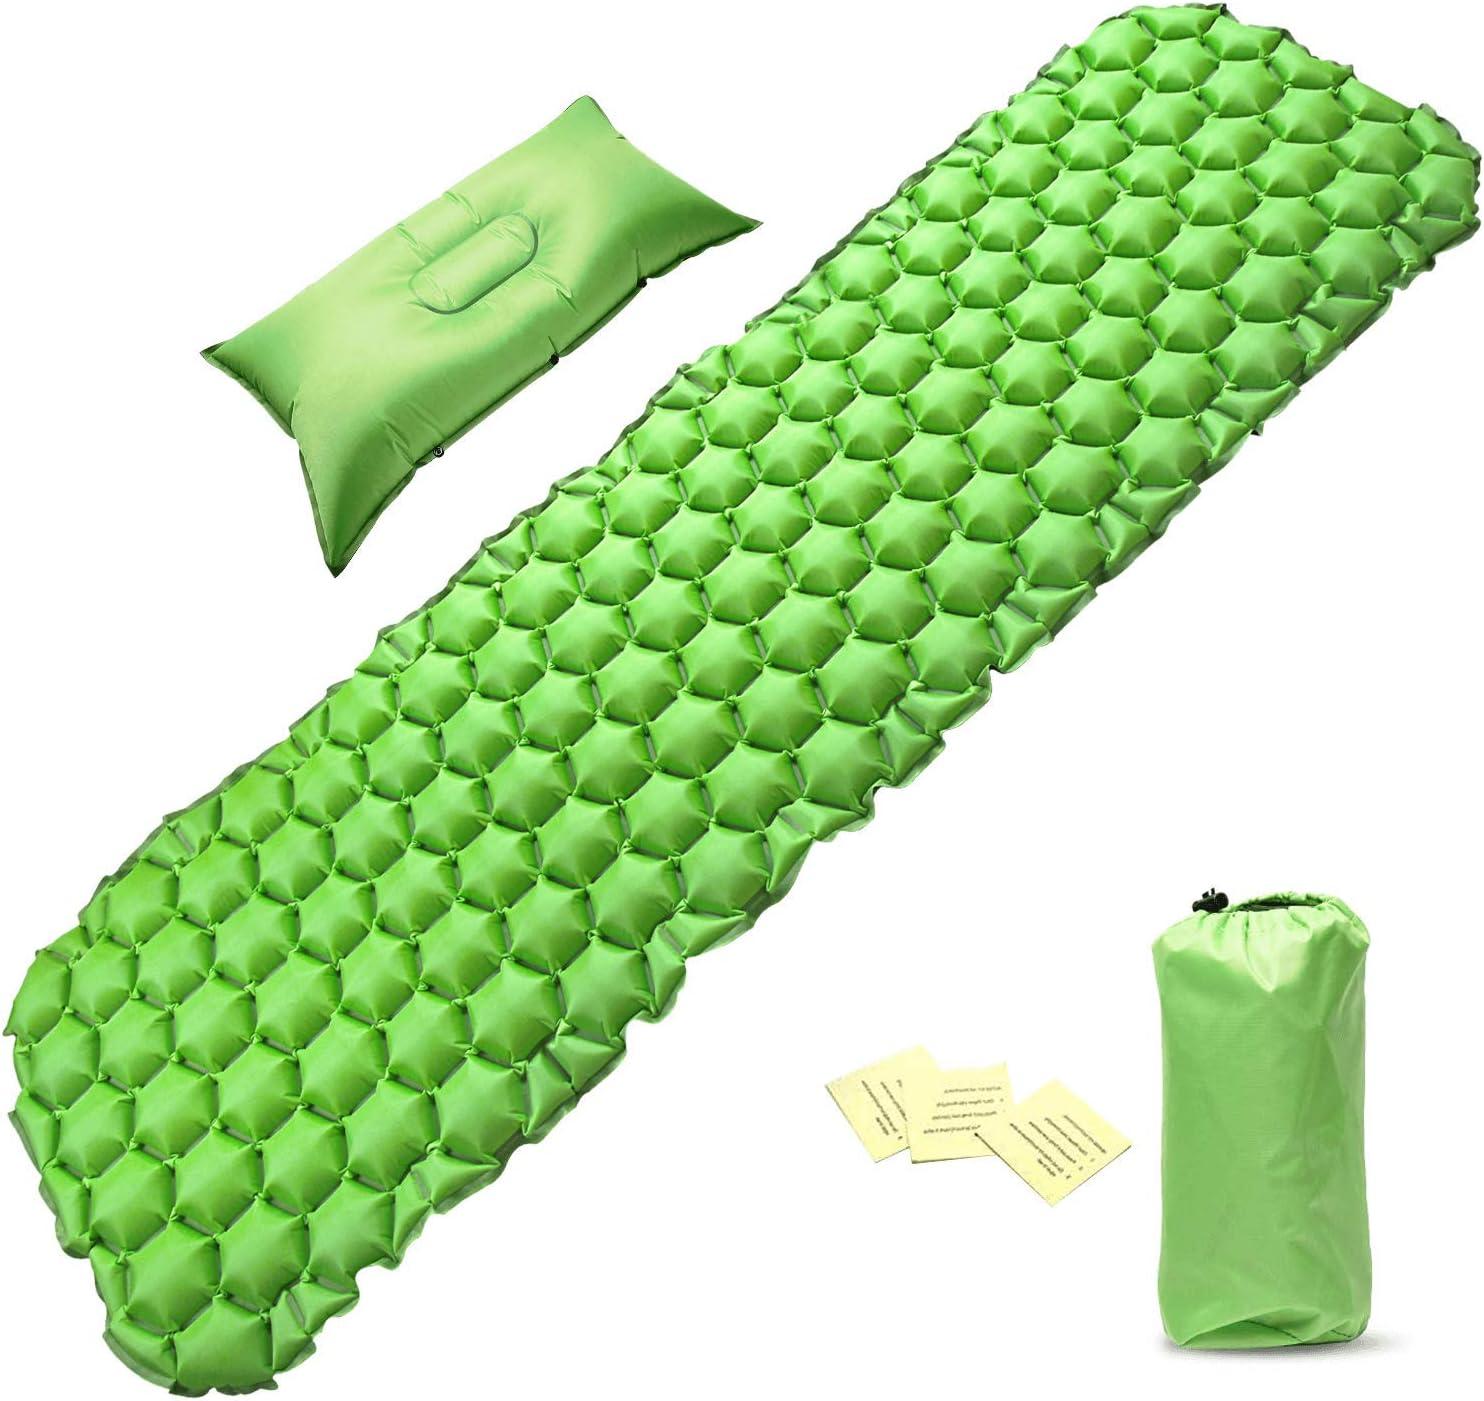 Inflatable Compact Camping Sleeping Pad Hiking Air Mattress Green w// Pillow**